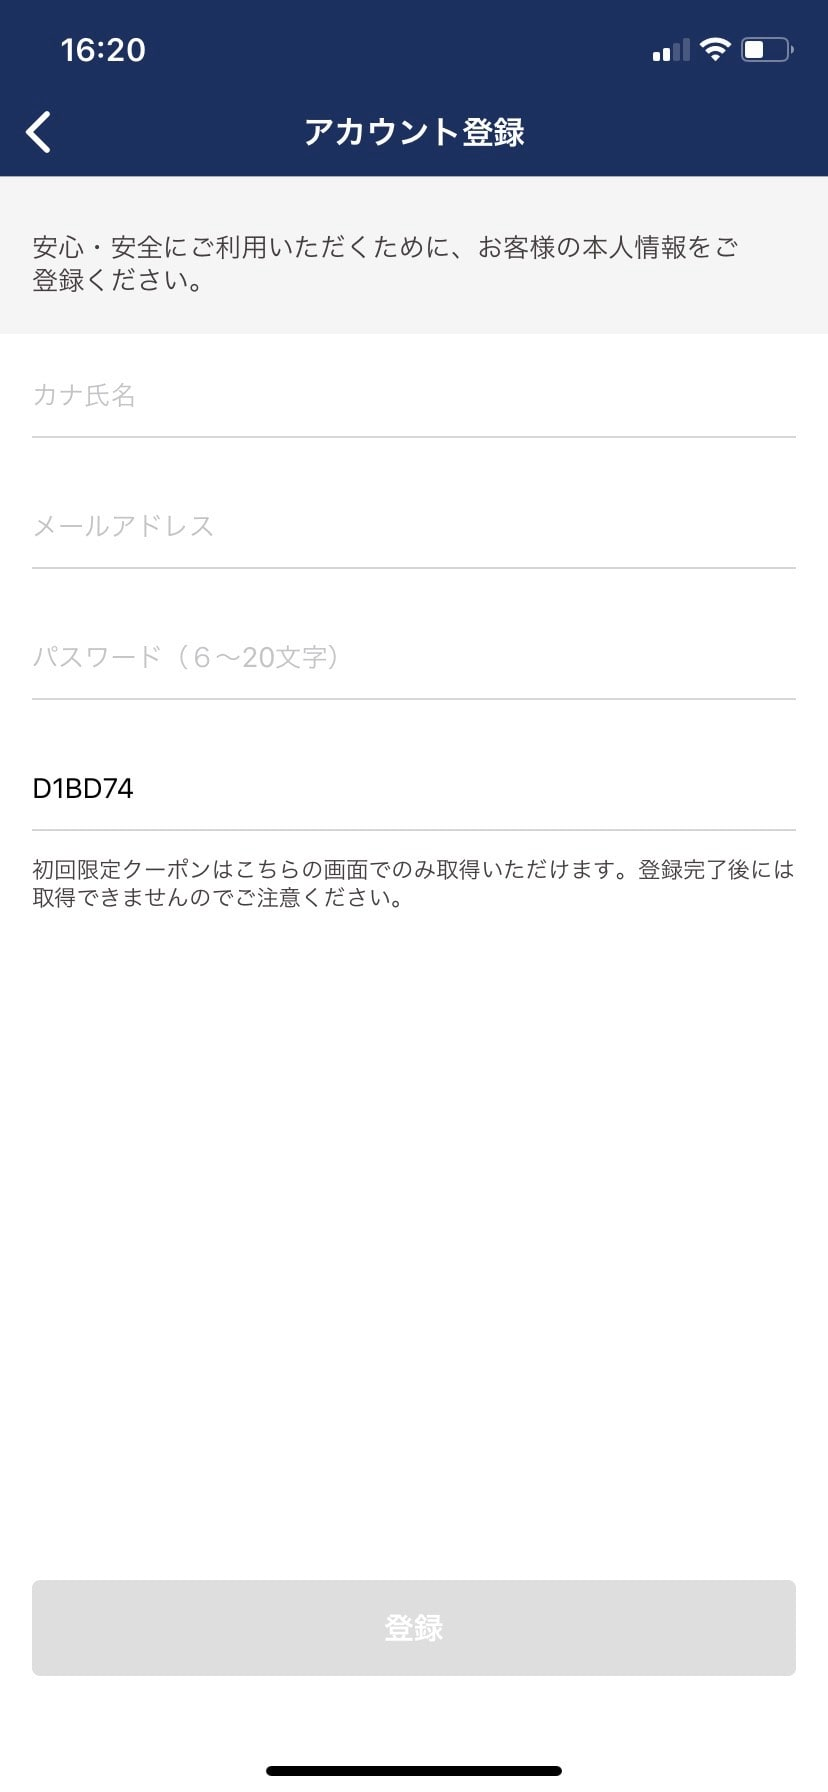 JapanTaxiの初回限定クーポン入力